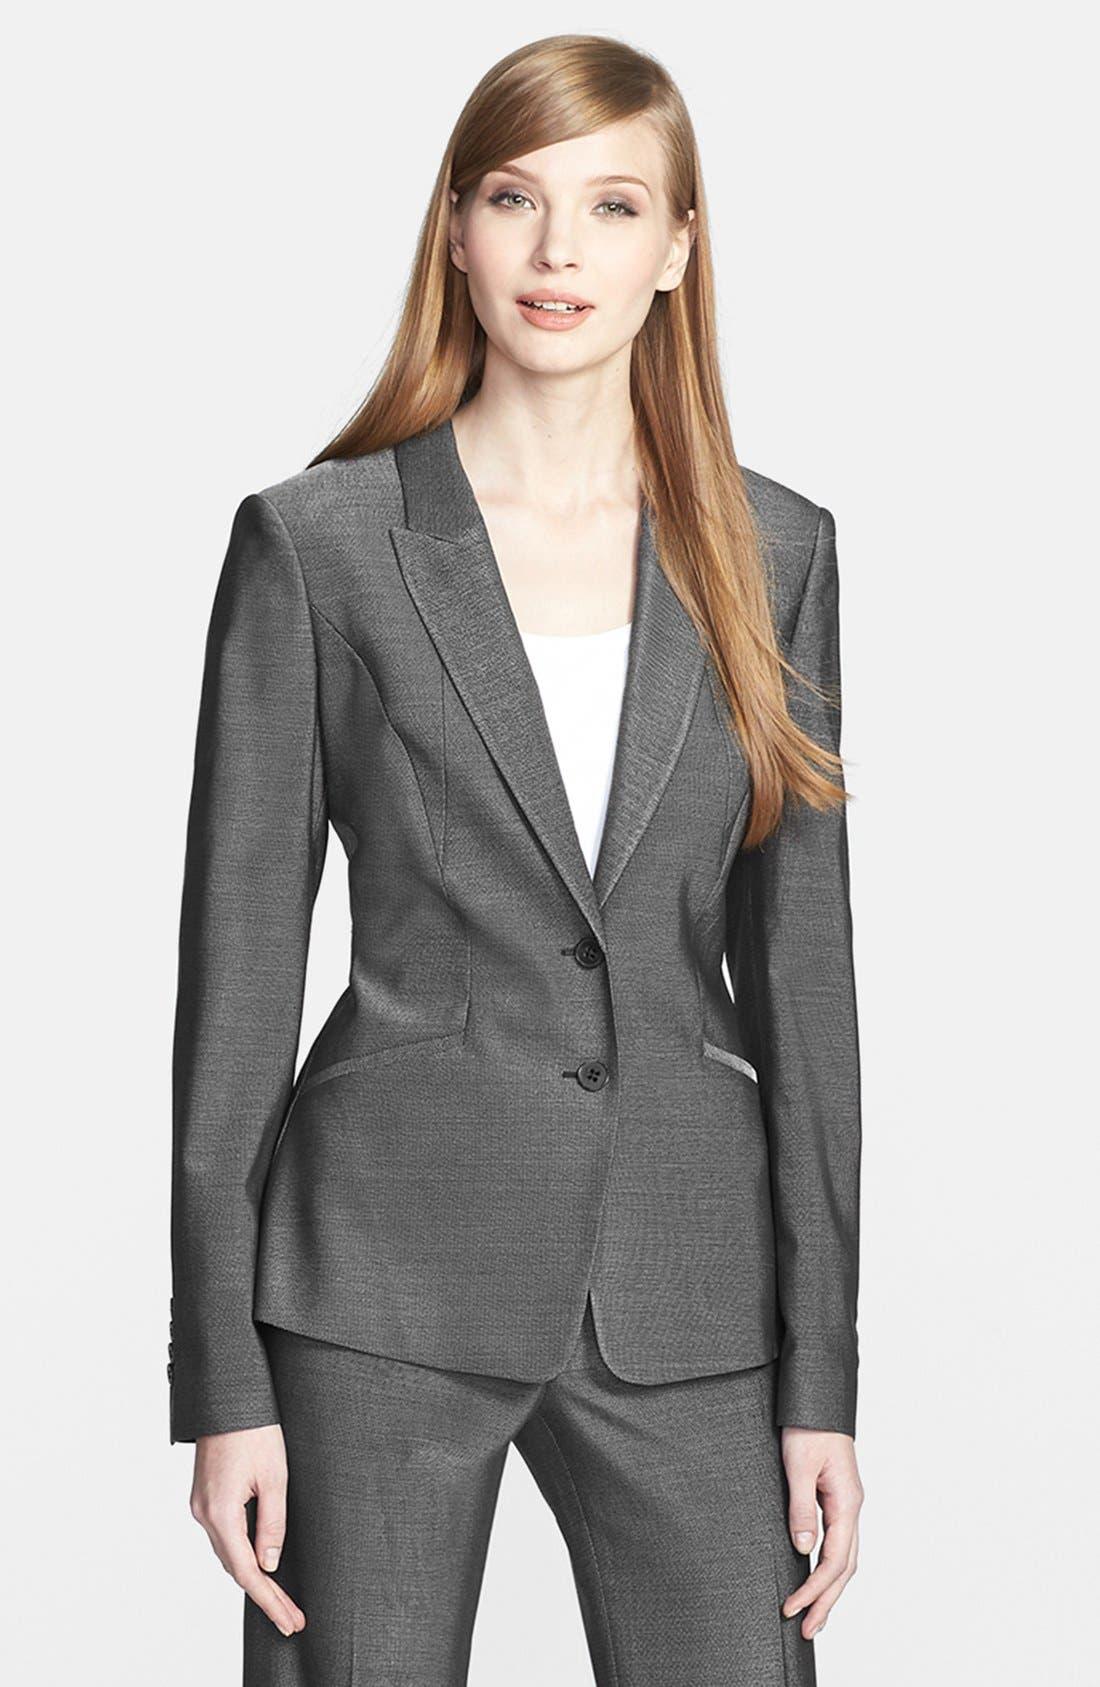 Main Image - BOSS HUGO BOSS 'Jolisa' Stretch Wool Suiting Jacket